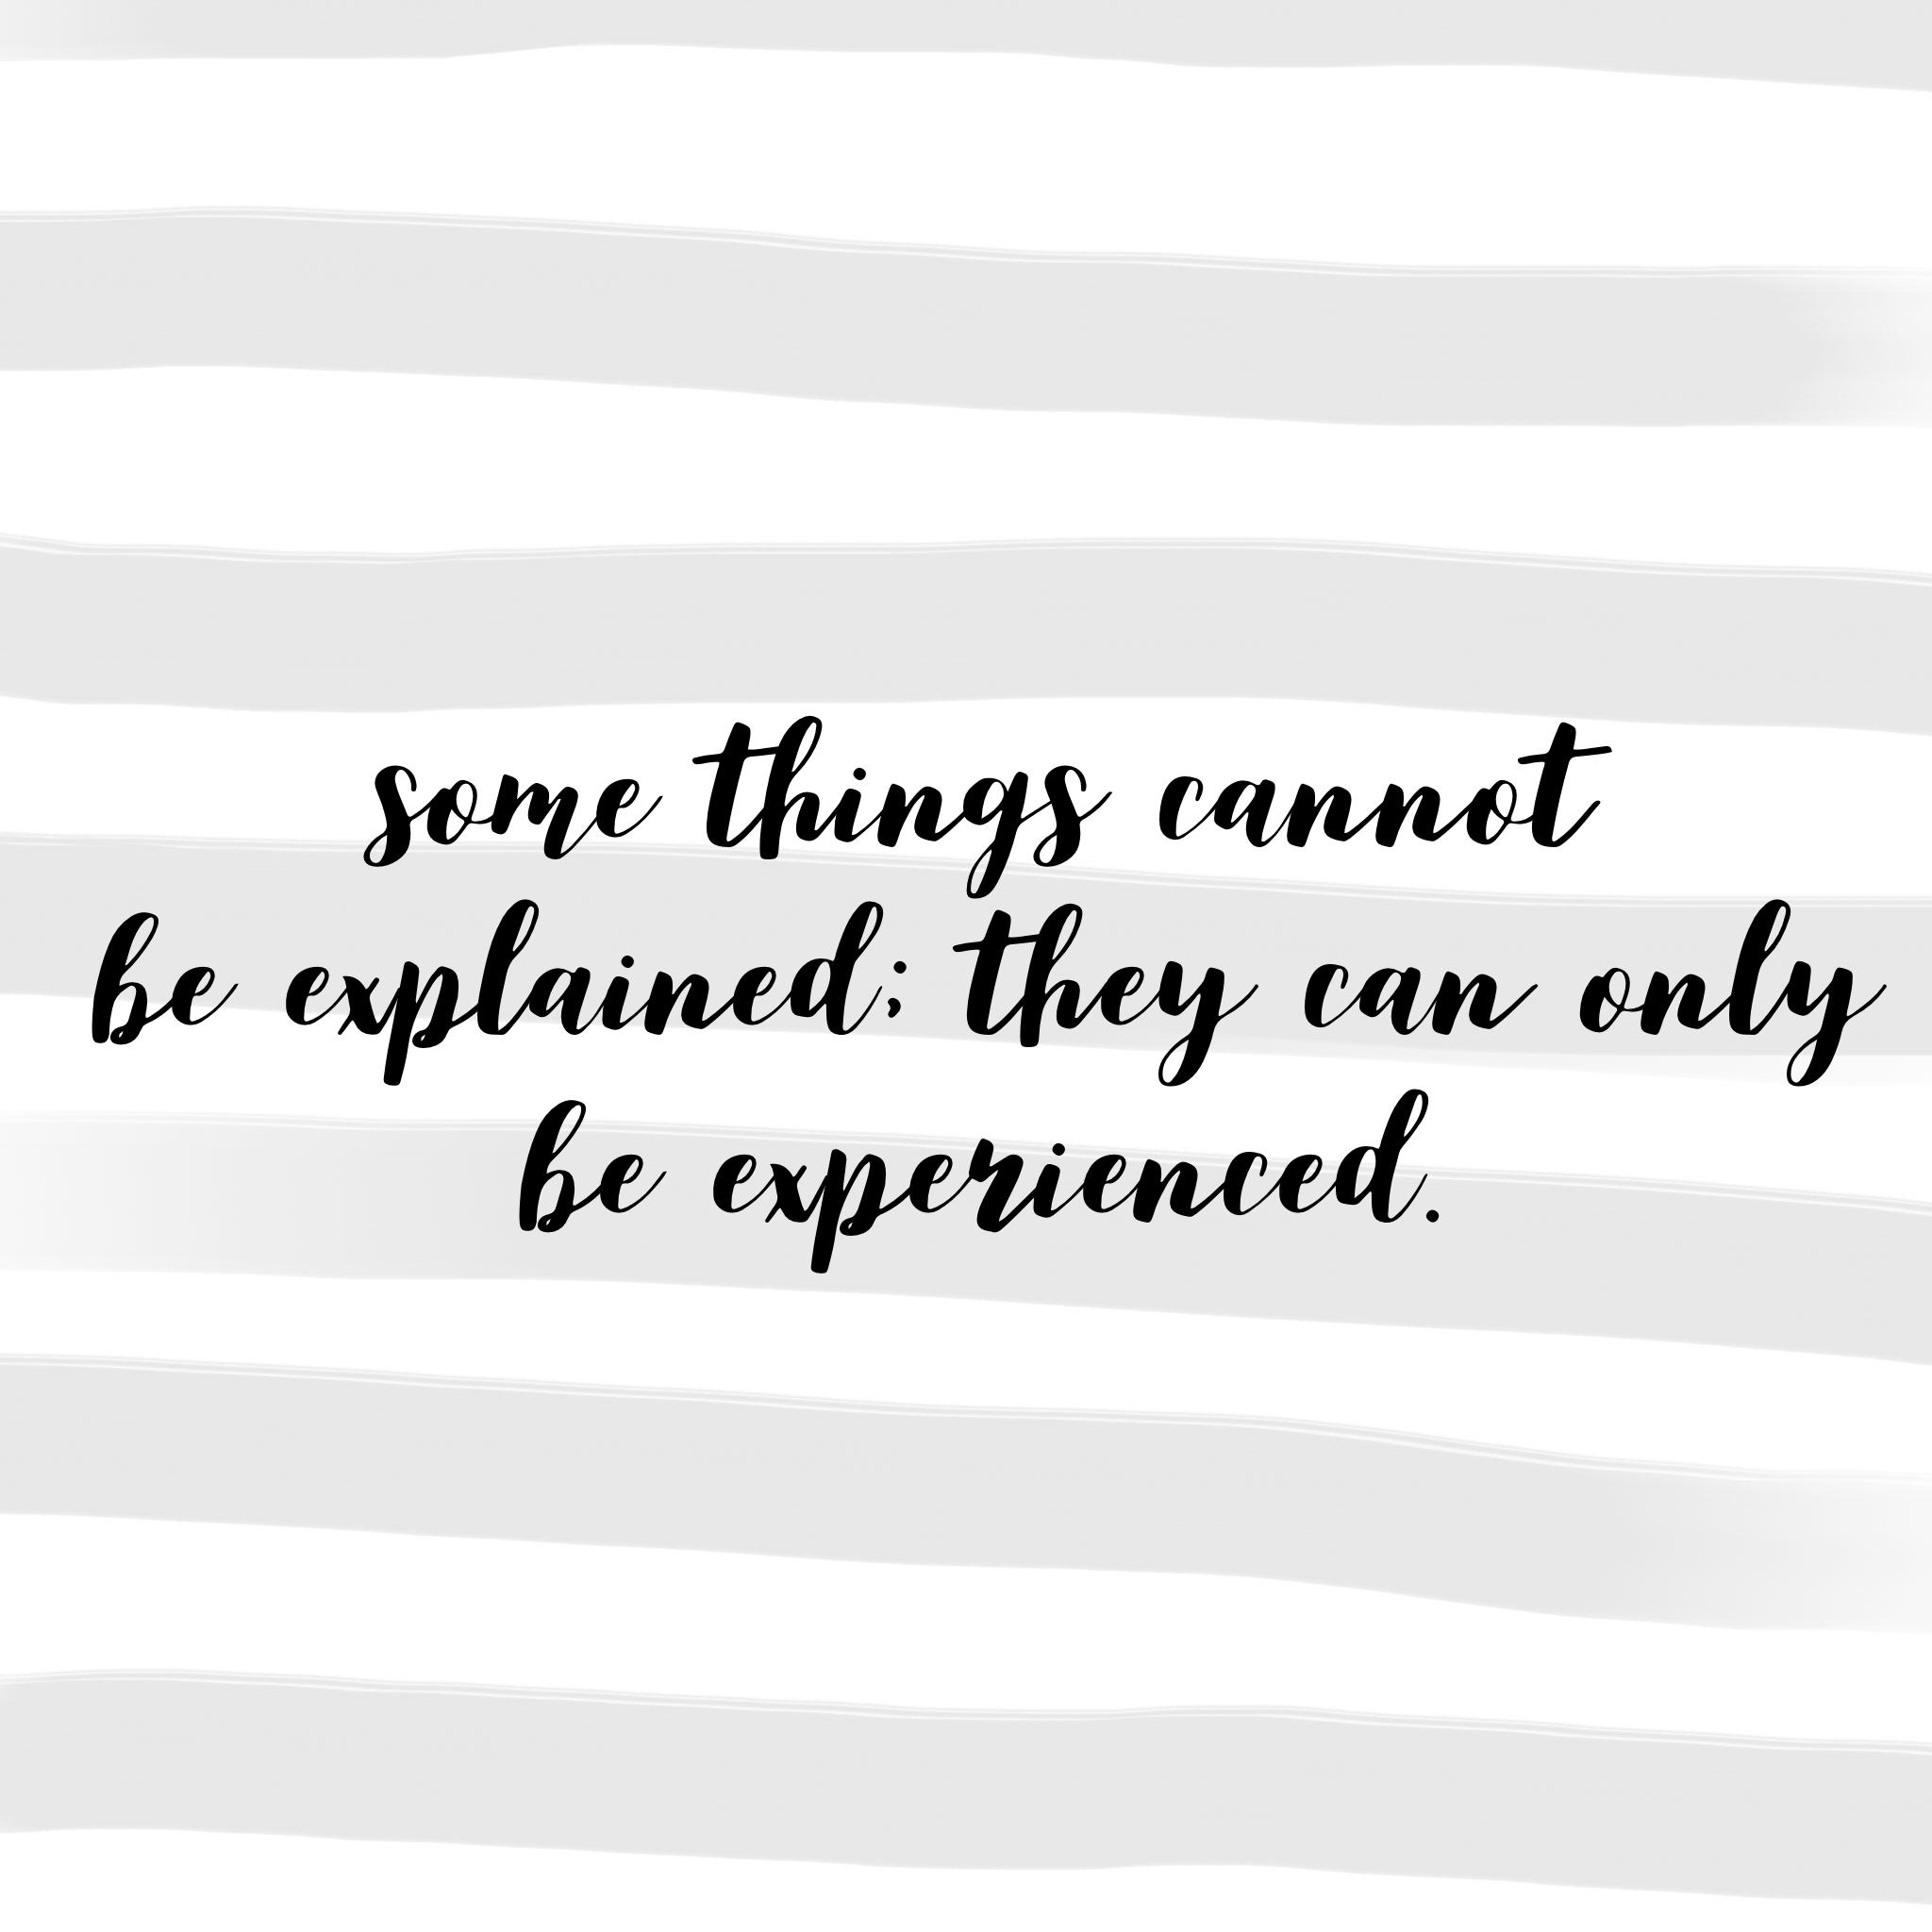 BLOGpic—ExplainedExperienced.PNG